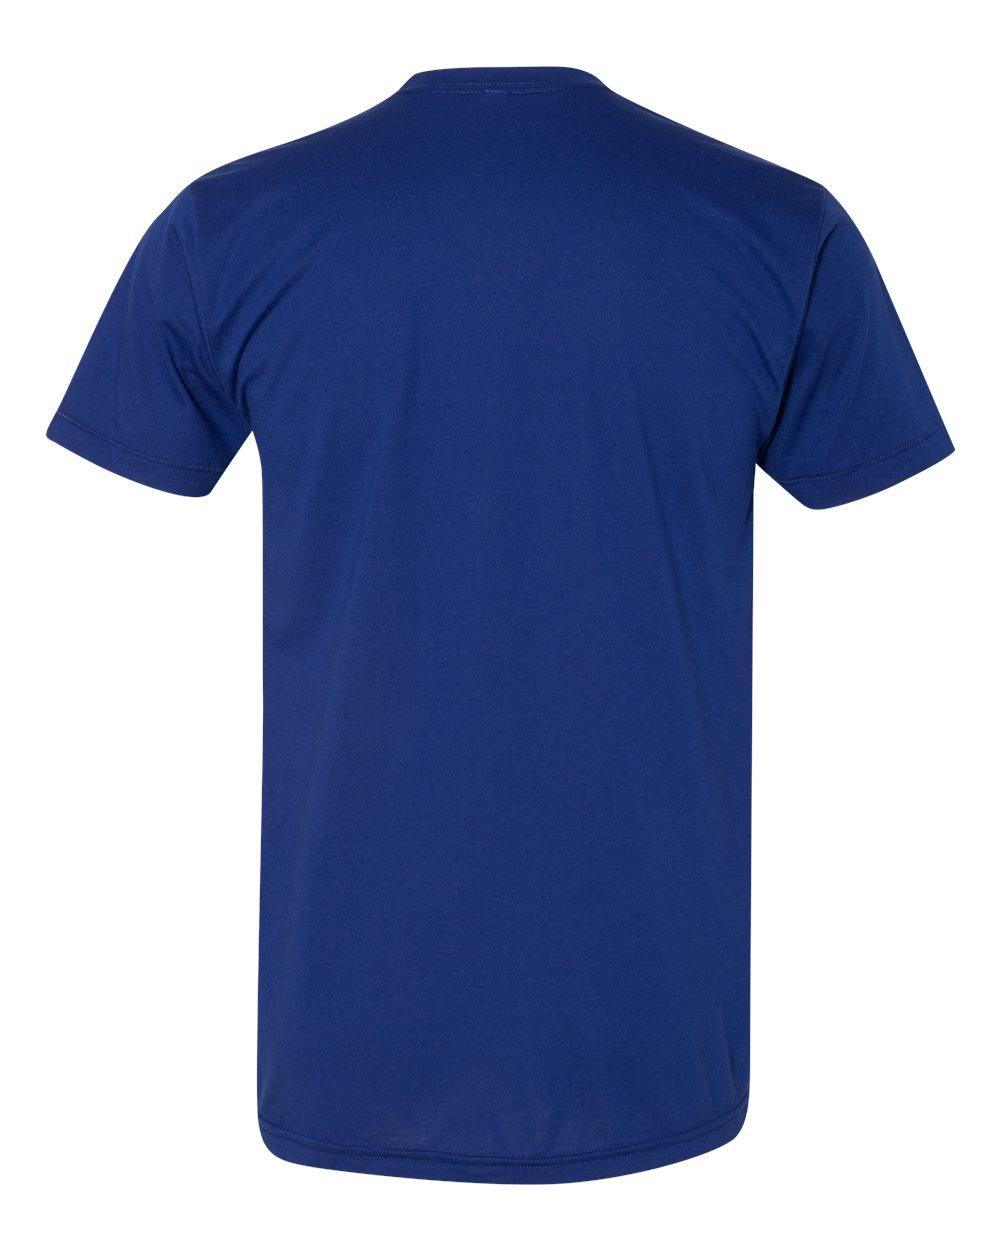 American-Apparel-Mens-Slim-Fit-50-50-Cotton-T-Shirt-Tee-BB401W-up-to-2XL thumbnail 40